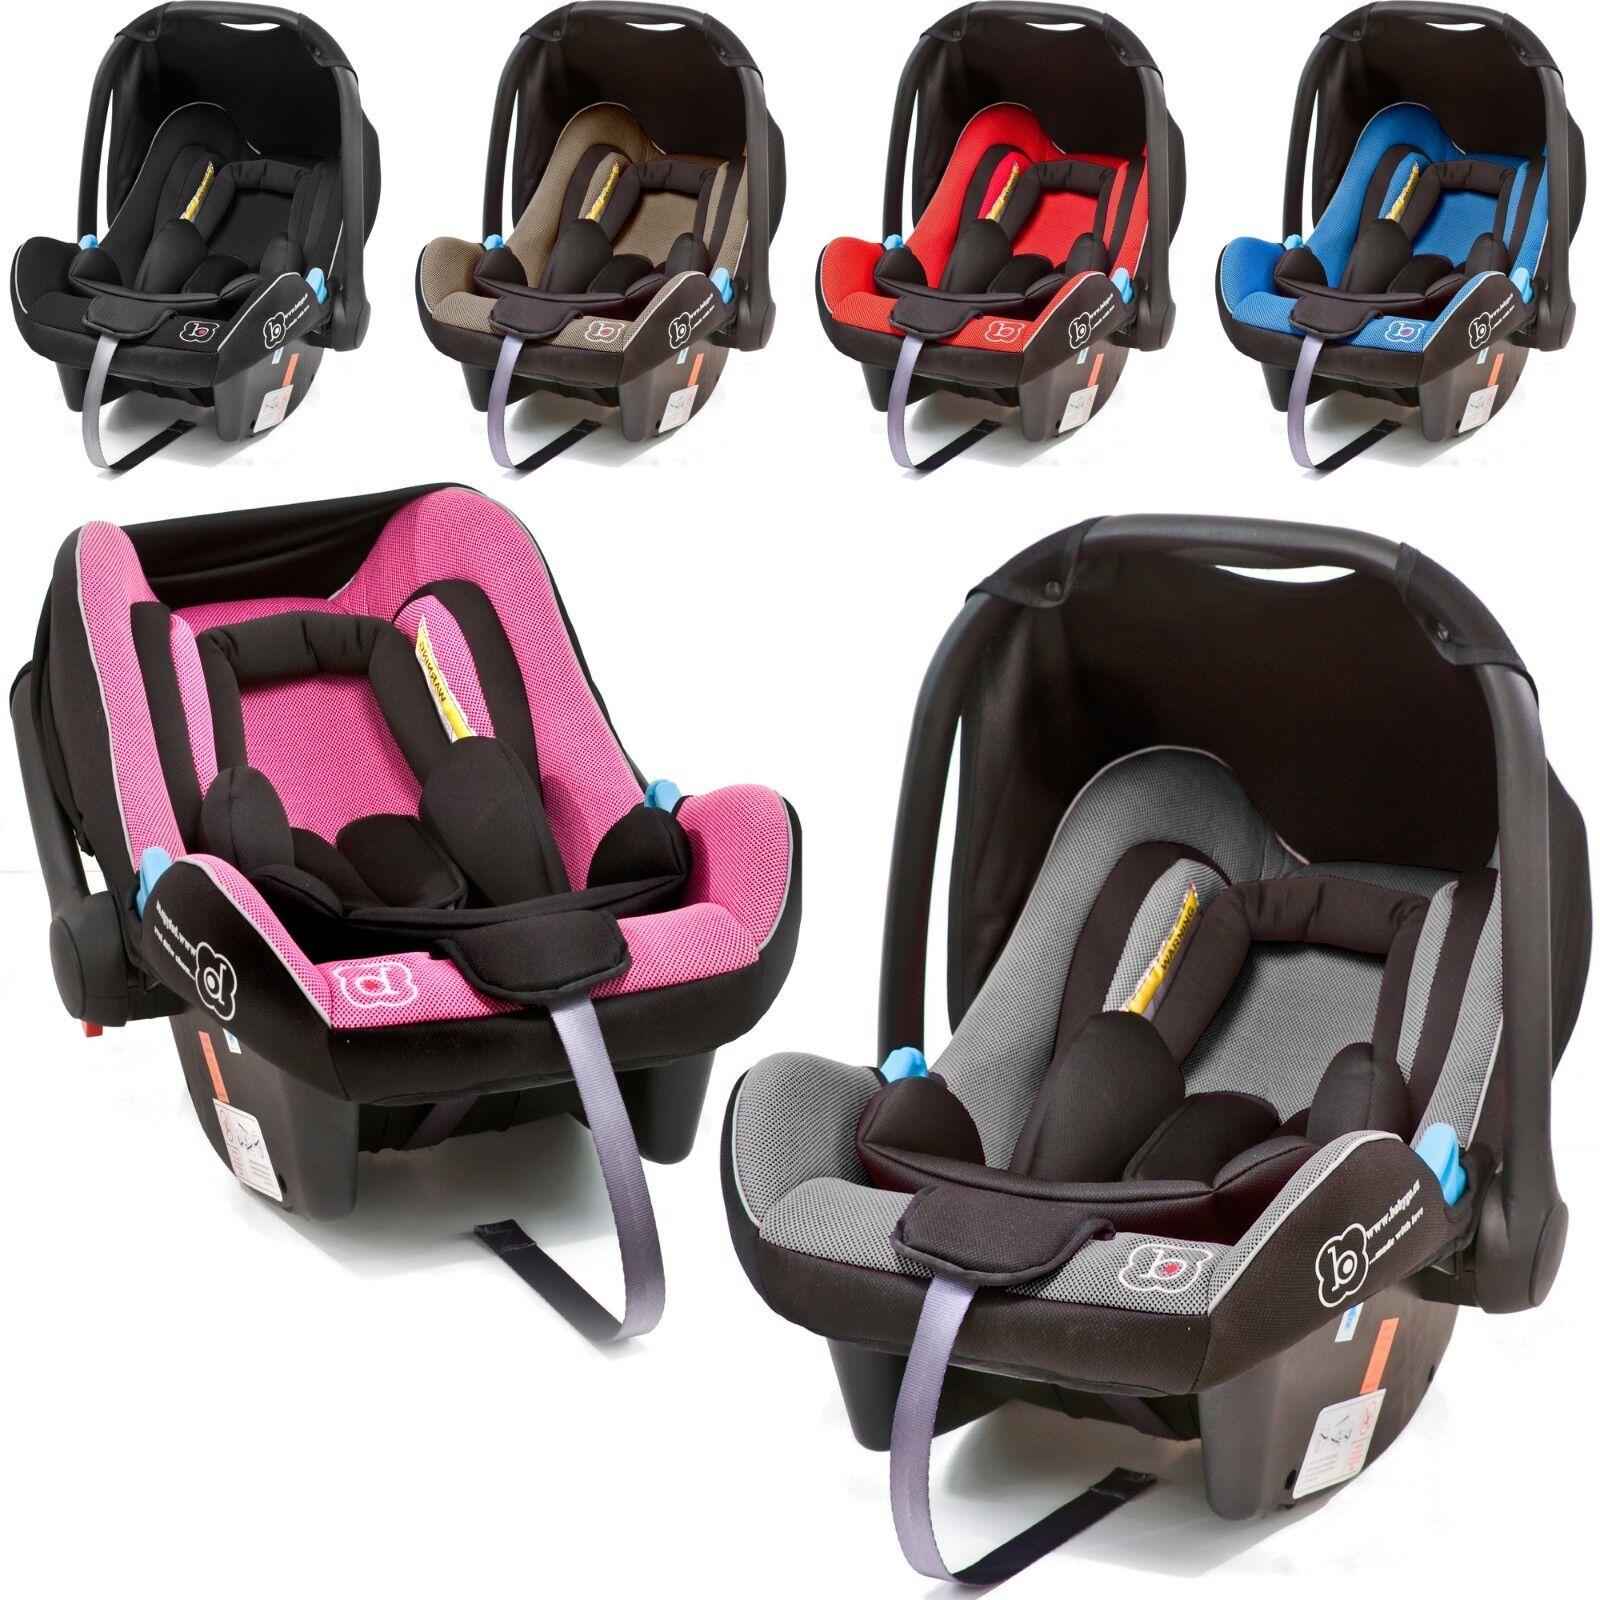 BabyGo Babyschale Autositz Travel XP 0-13kg Auto Kindersitz Kinder Babysitz Baby